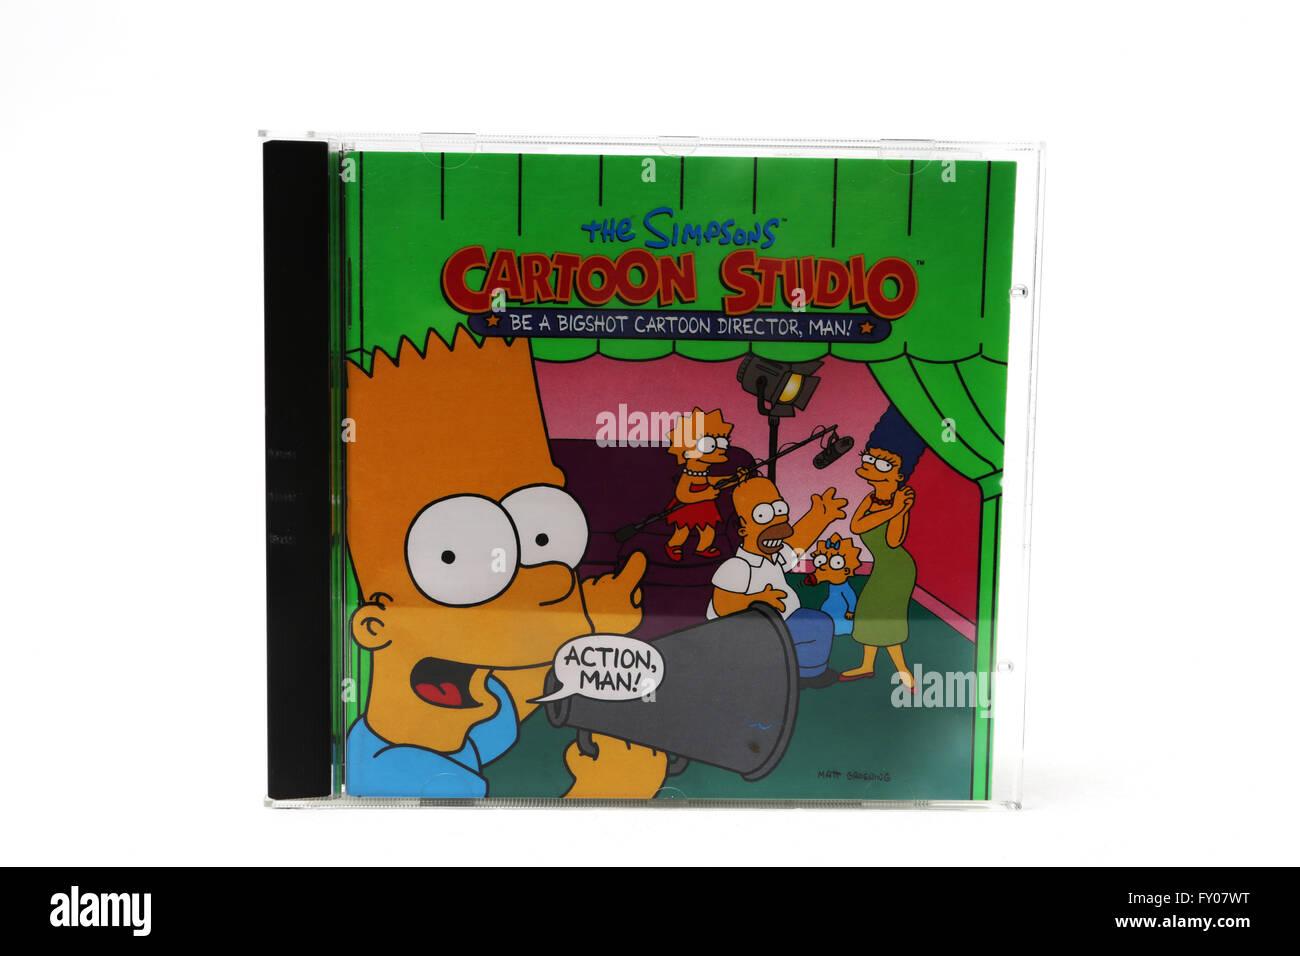 The Simpsons Cartoon Studio Computer Game CD Rom - Stock Image